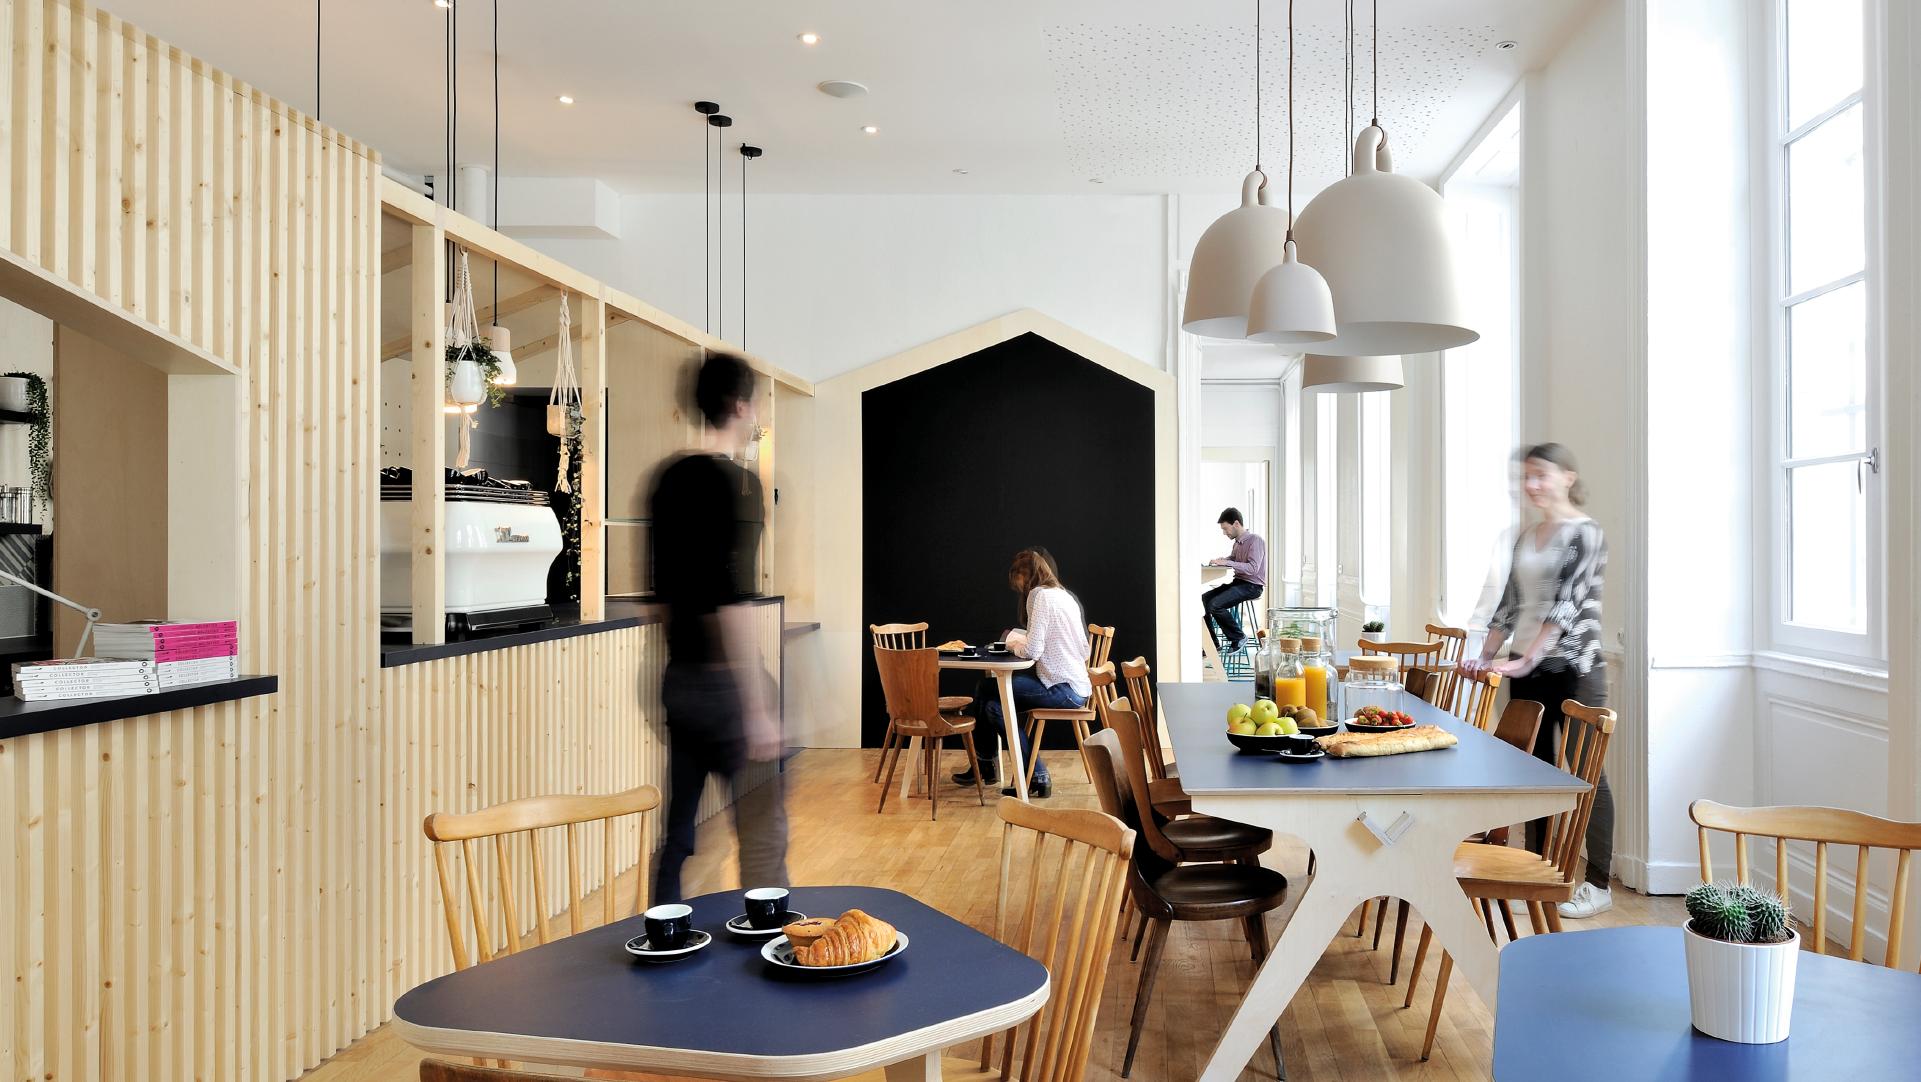 away hostel lyon auberge de jeunesse coffee shop. Black Bedroom Furniture Sets. Home Design Ideas